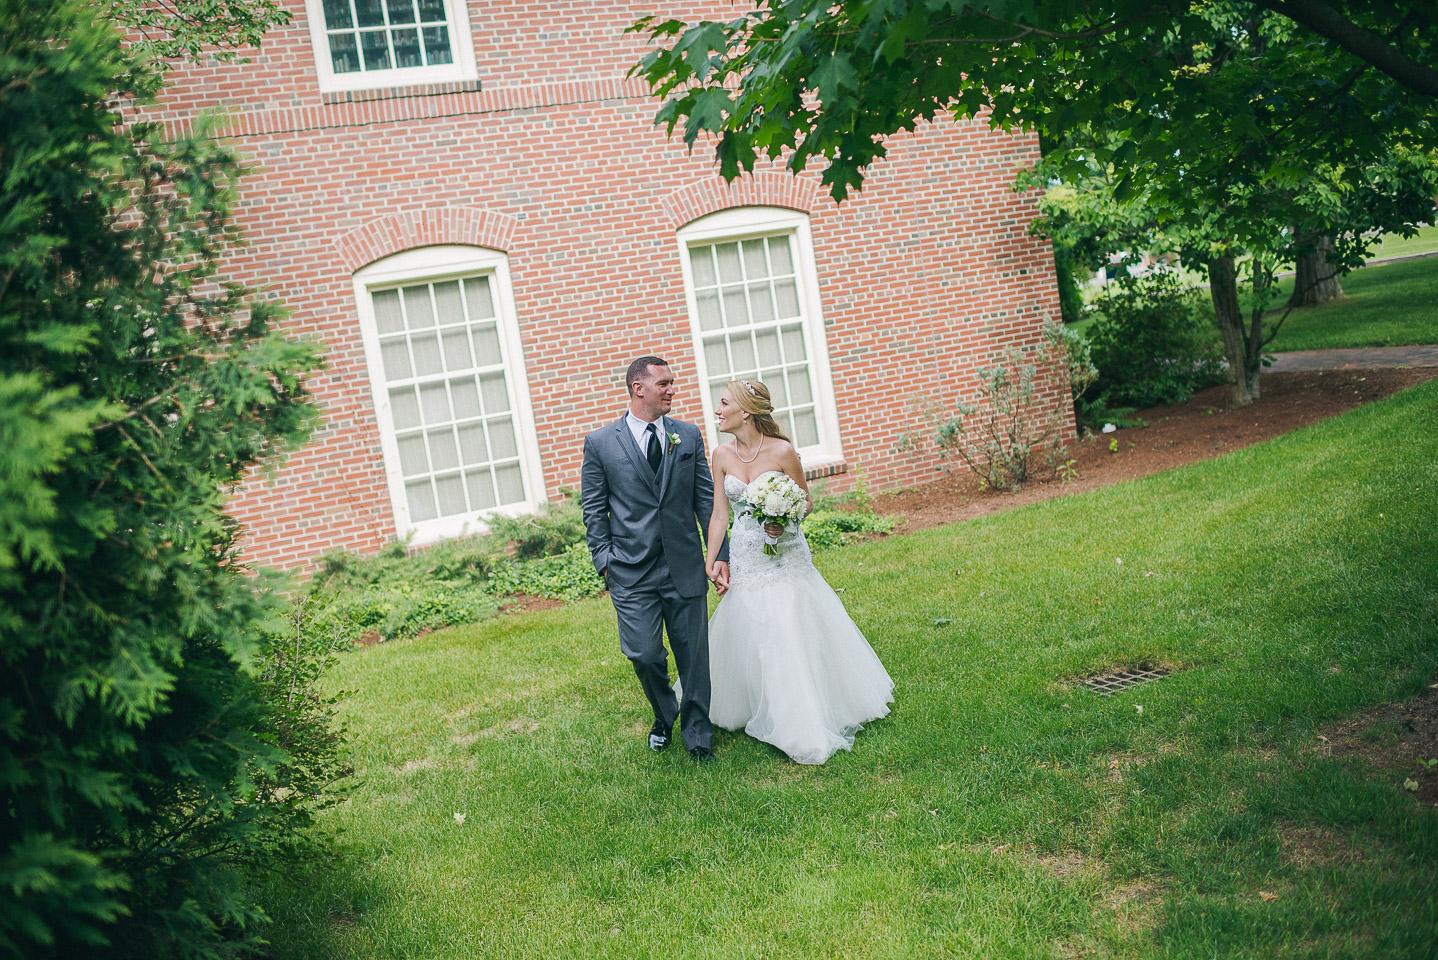 NH Wedding Photographer: bride and groom walking at Saint Anselm